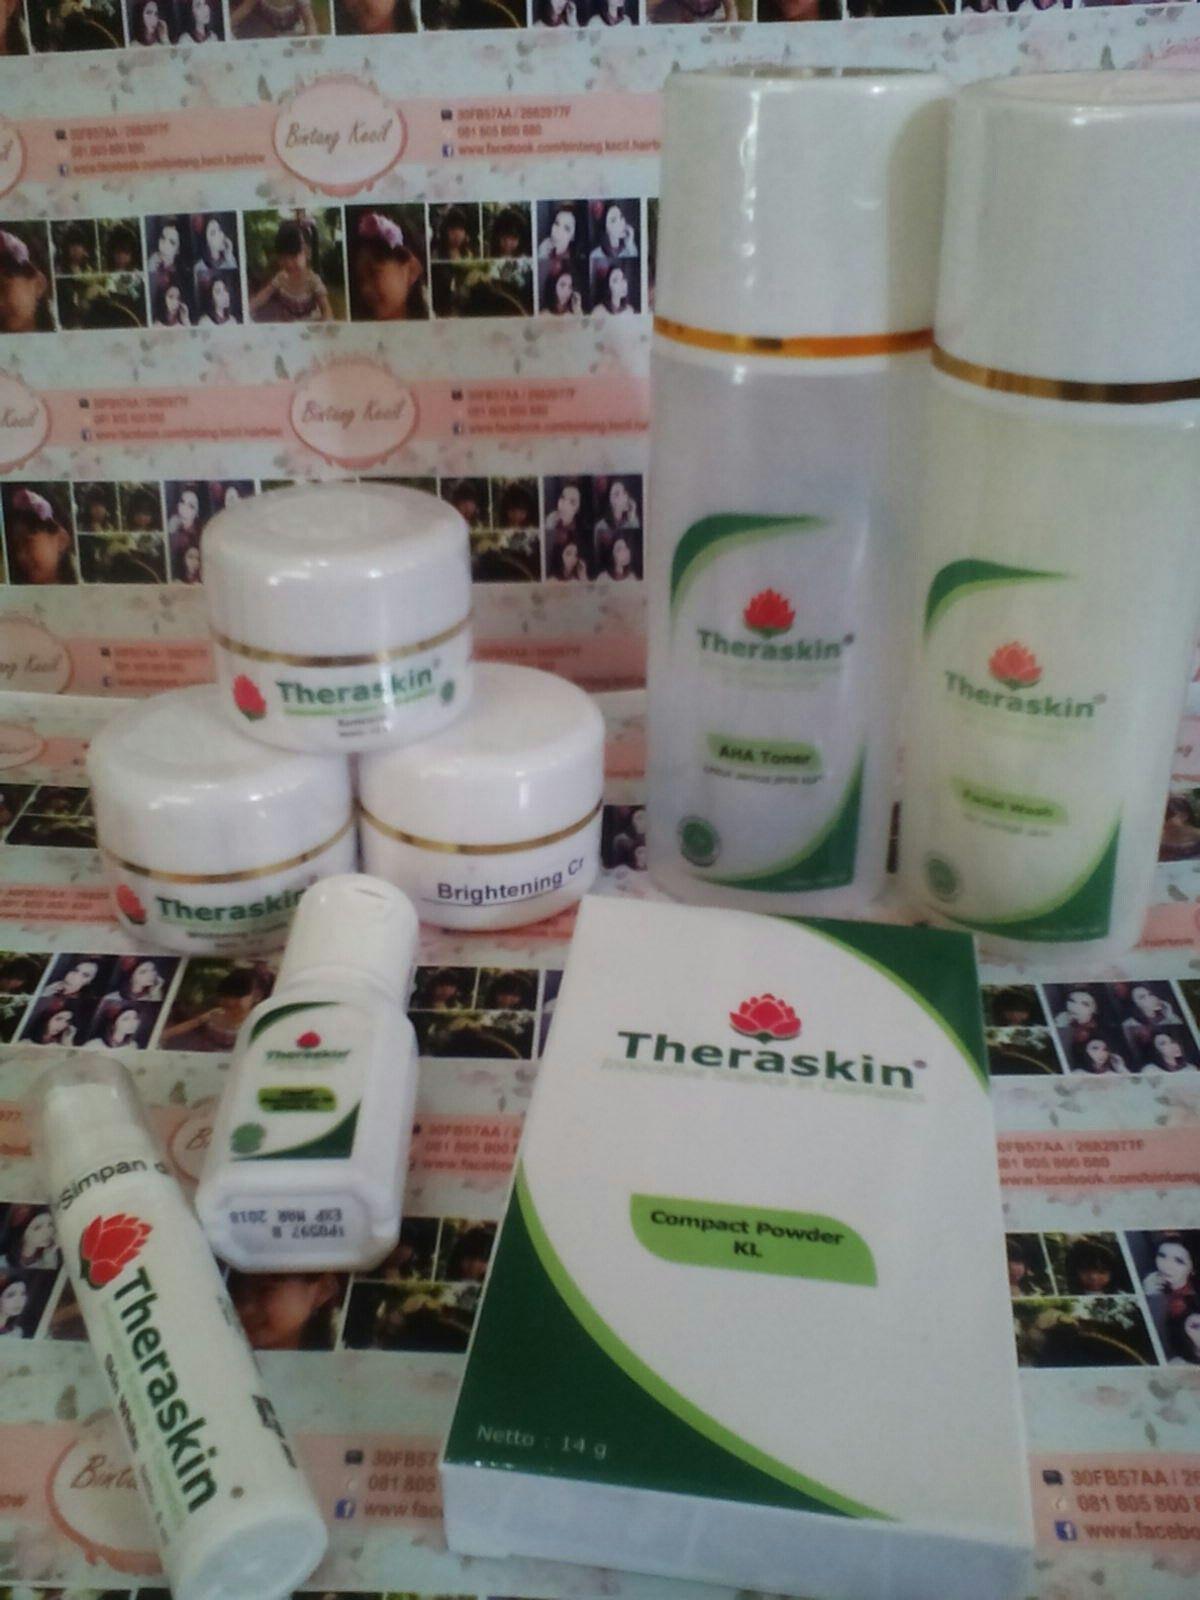 Pin By Sovilia Kang On Skincare Pinterest Theraskin Powder Skin Care Treatments